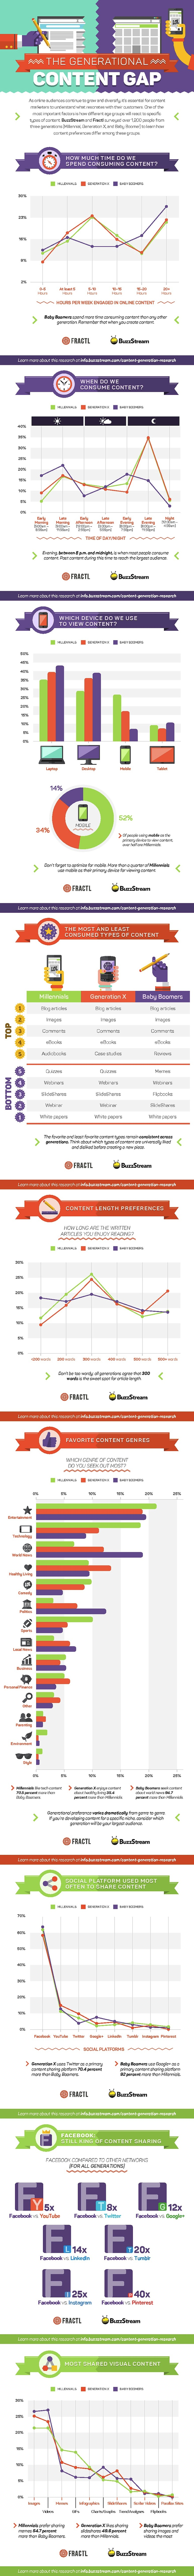 content marketing challenges 2015 - consumption